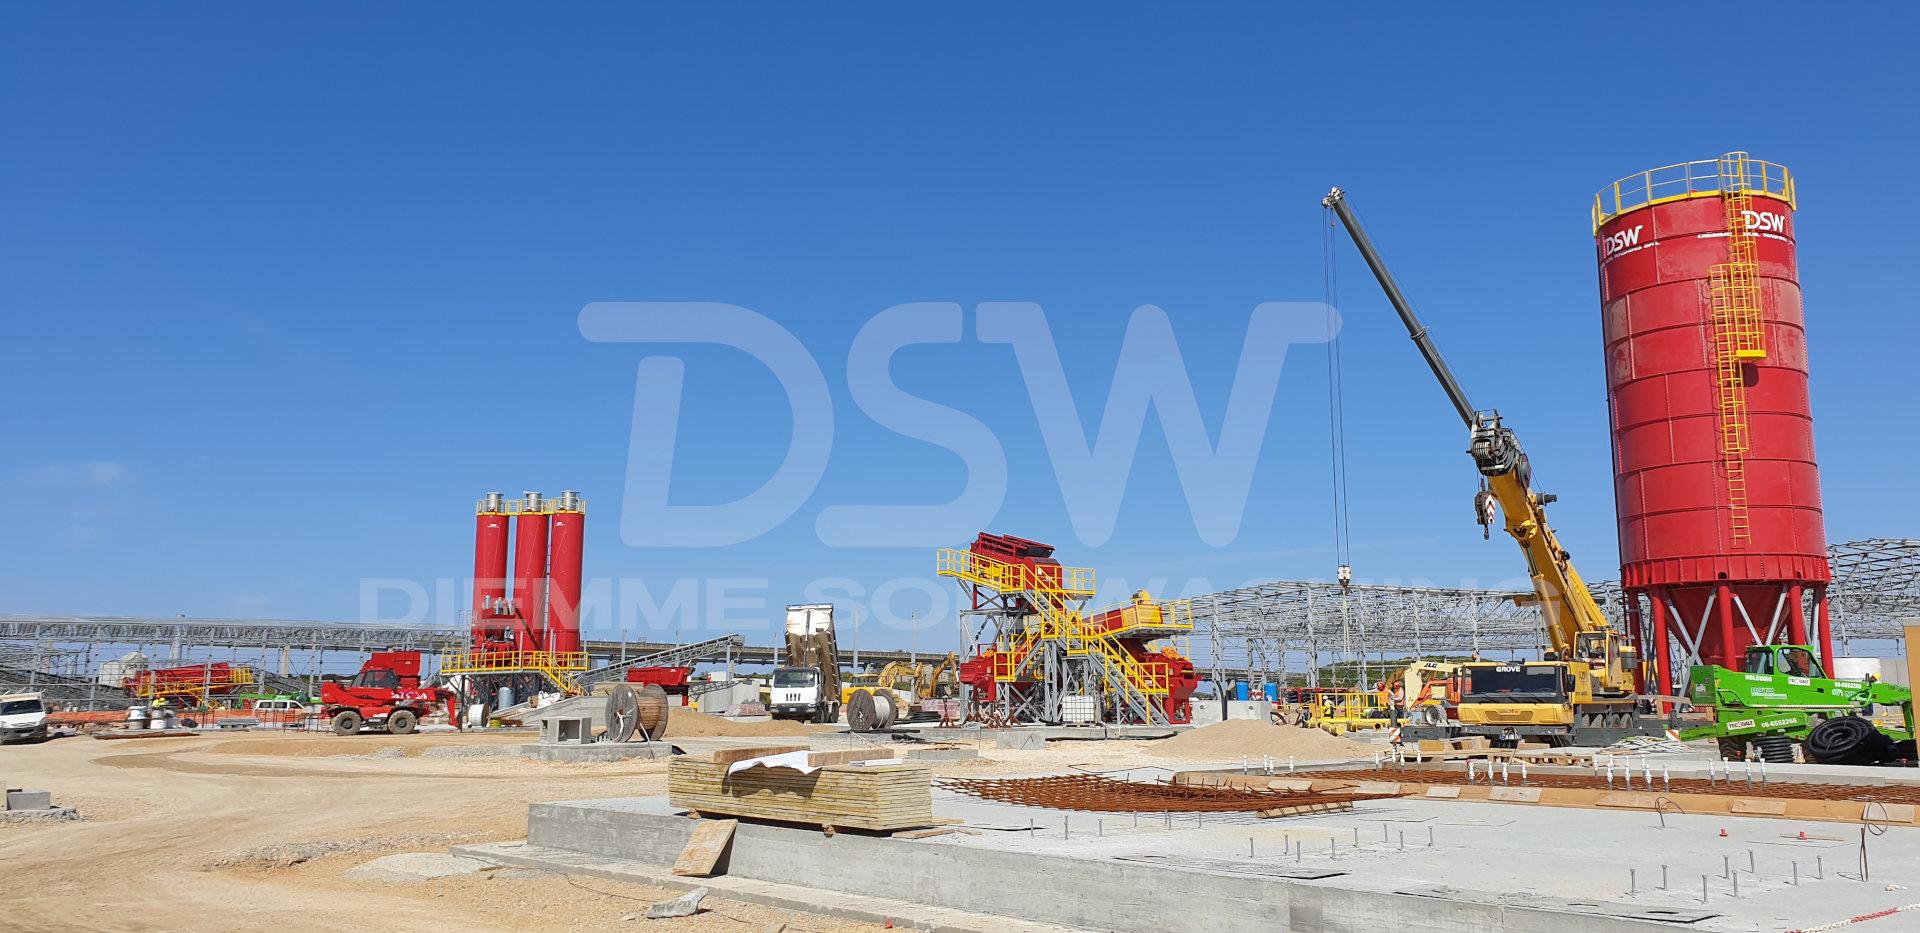 DSW Impianto Soil Washing 1